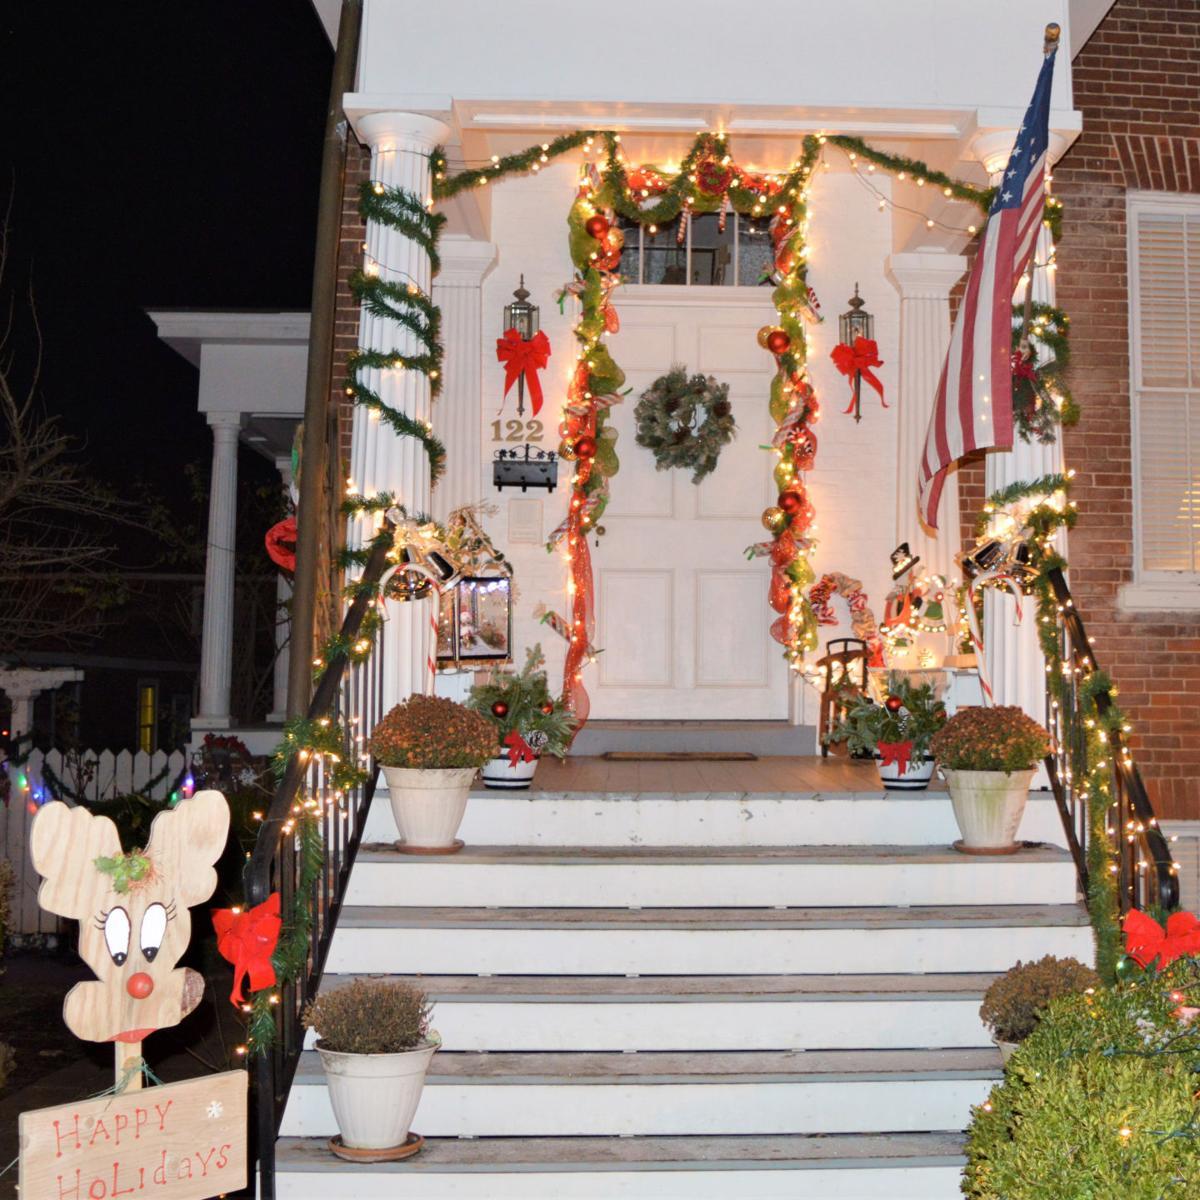 photo_ft_news_warrenton decorating_Best Holiday Spirit_1.jpg